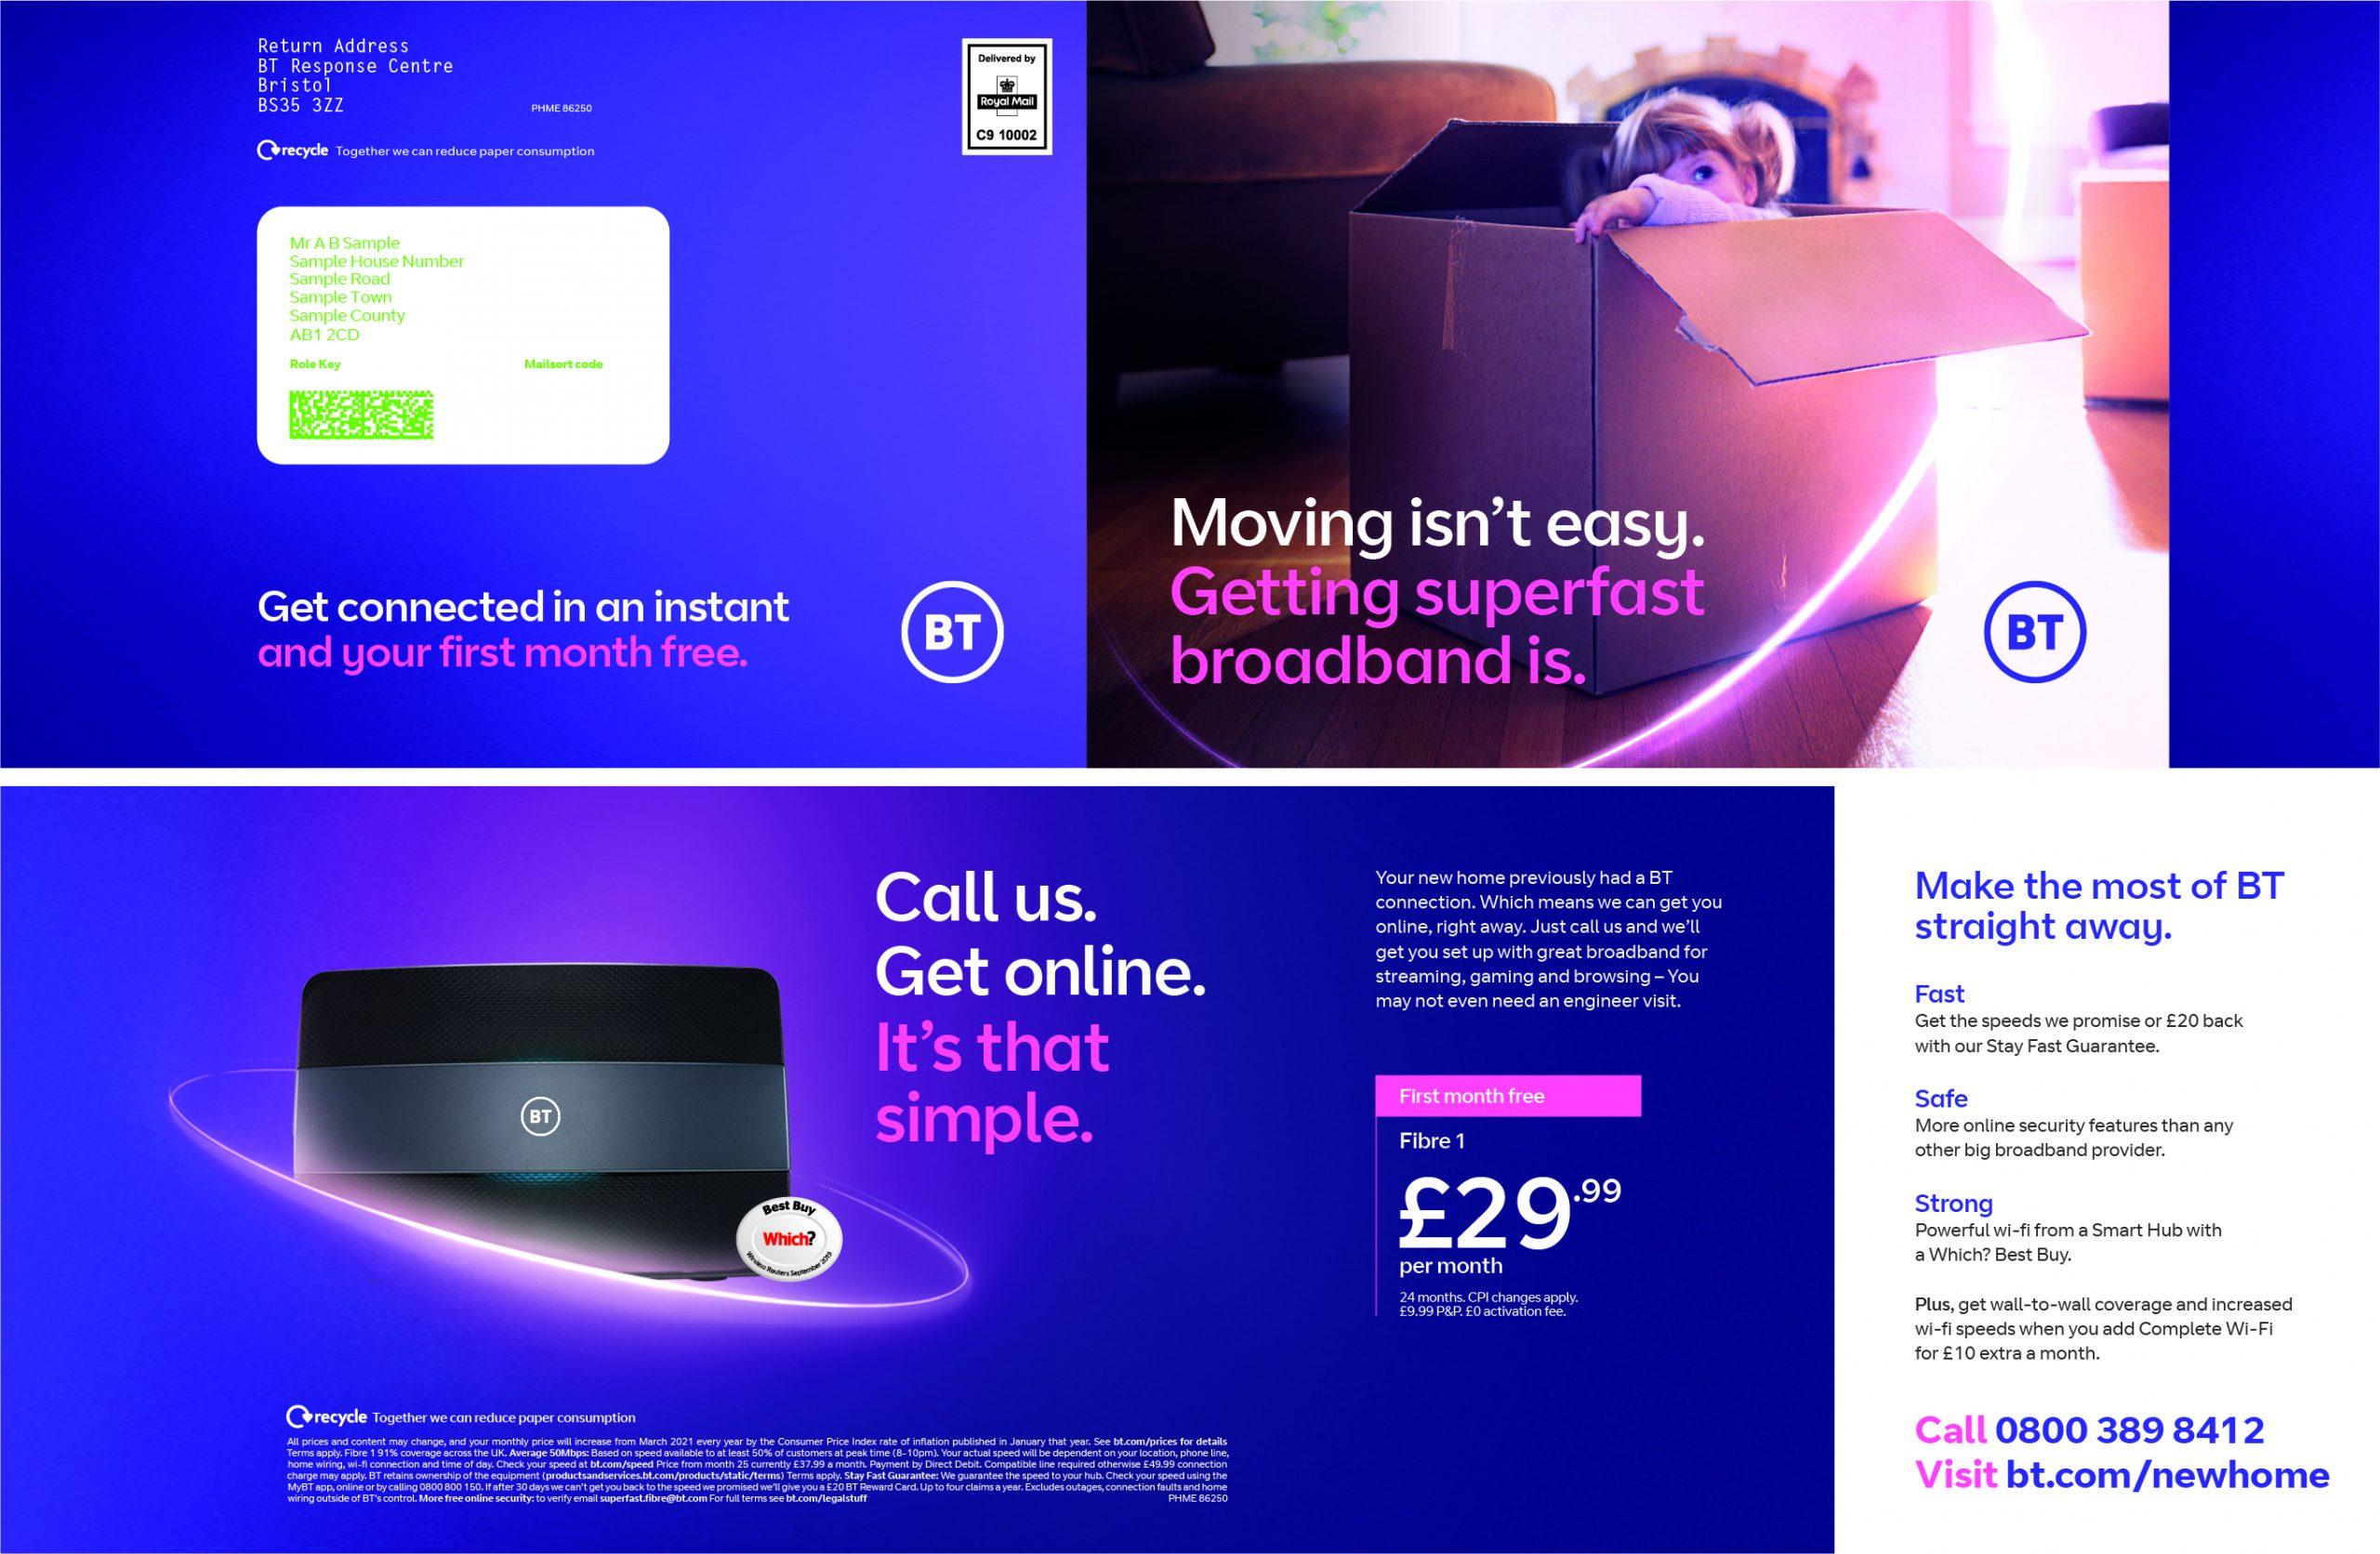 image of BT broadband mail sent to recent homemover